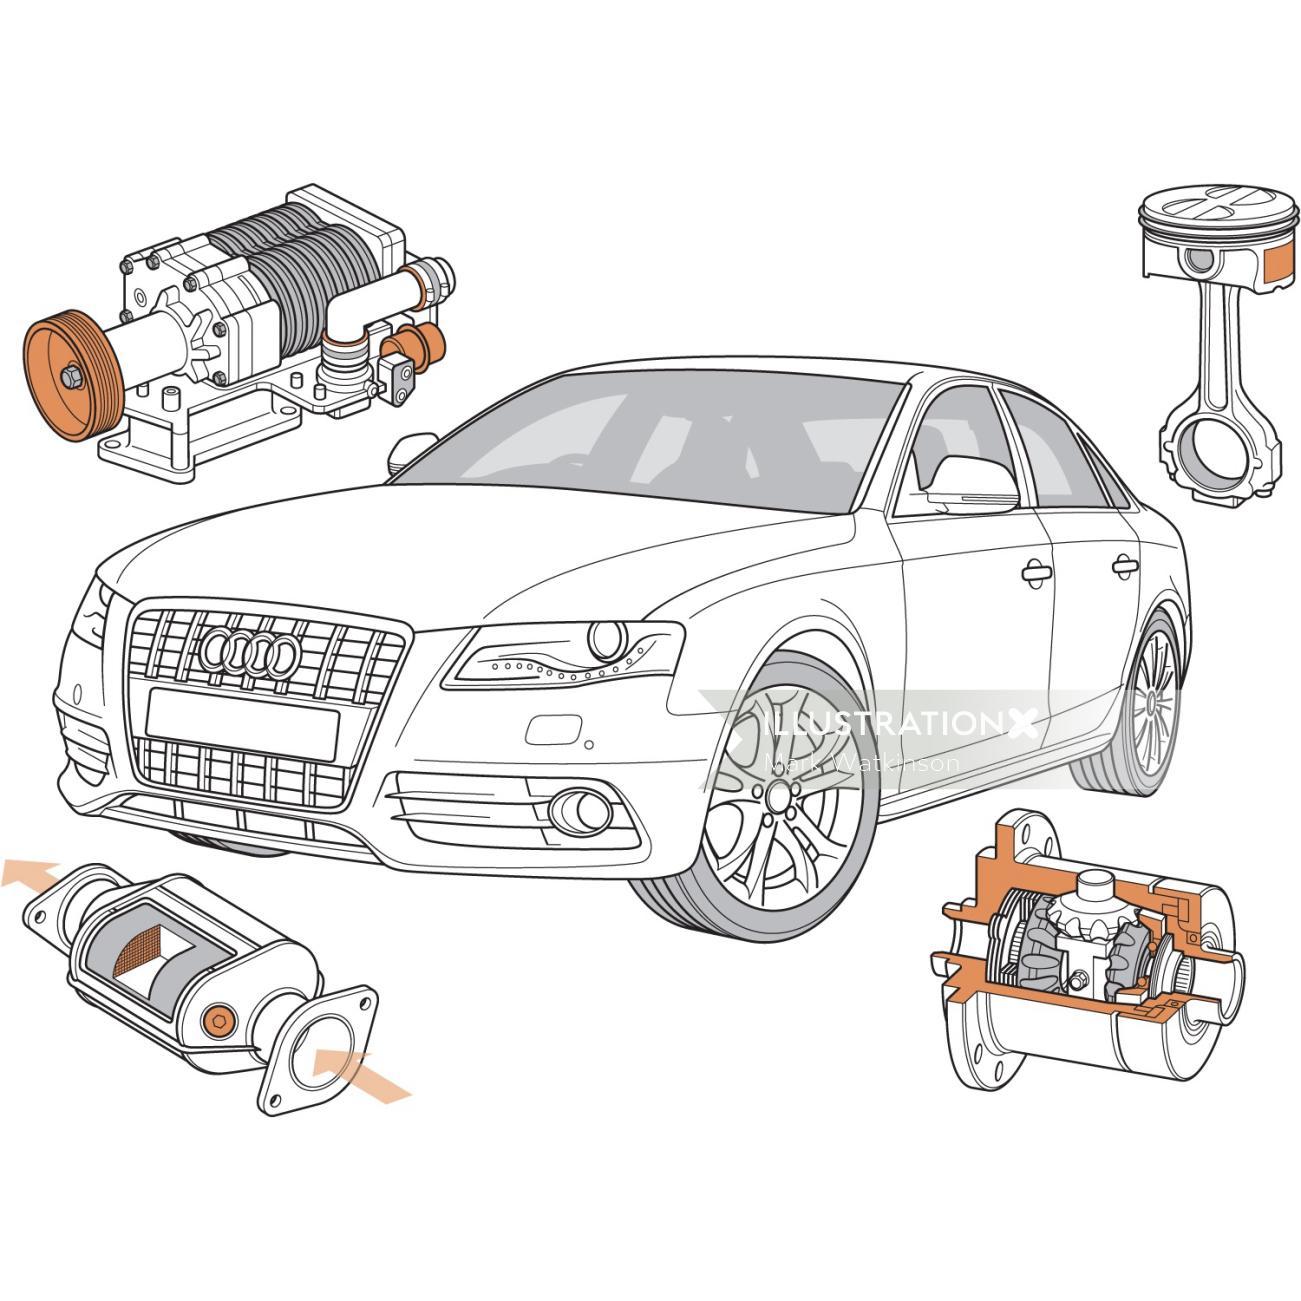 Technical illustration of car automobile